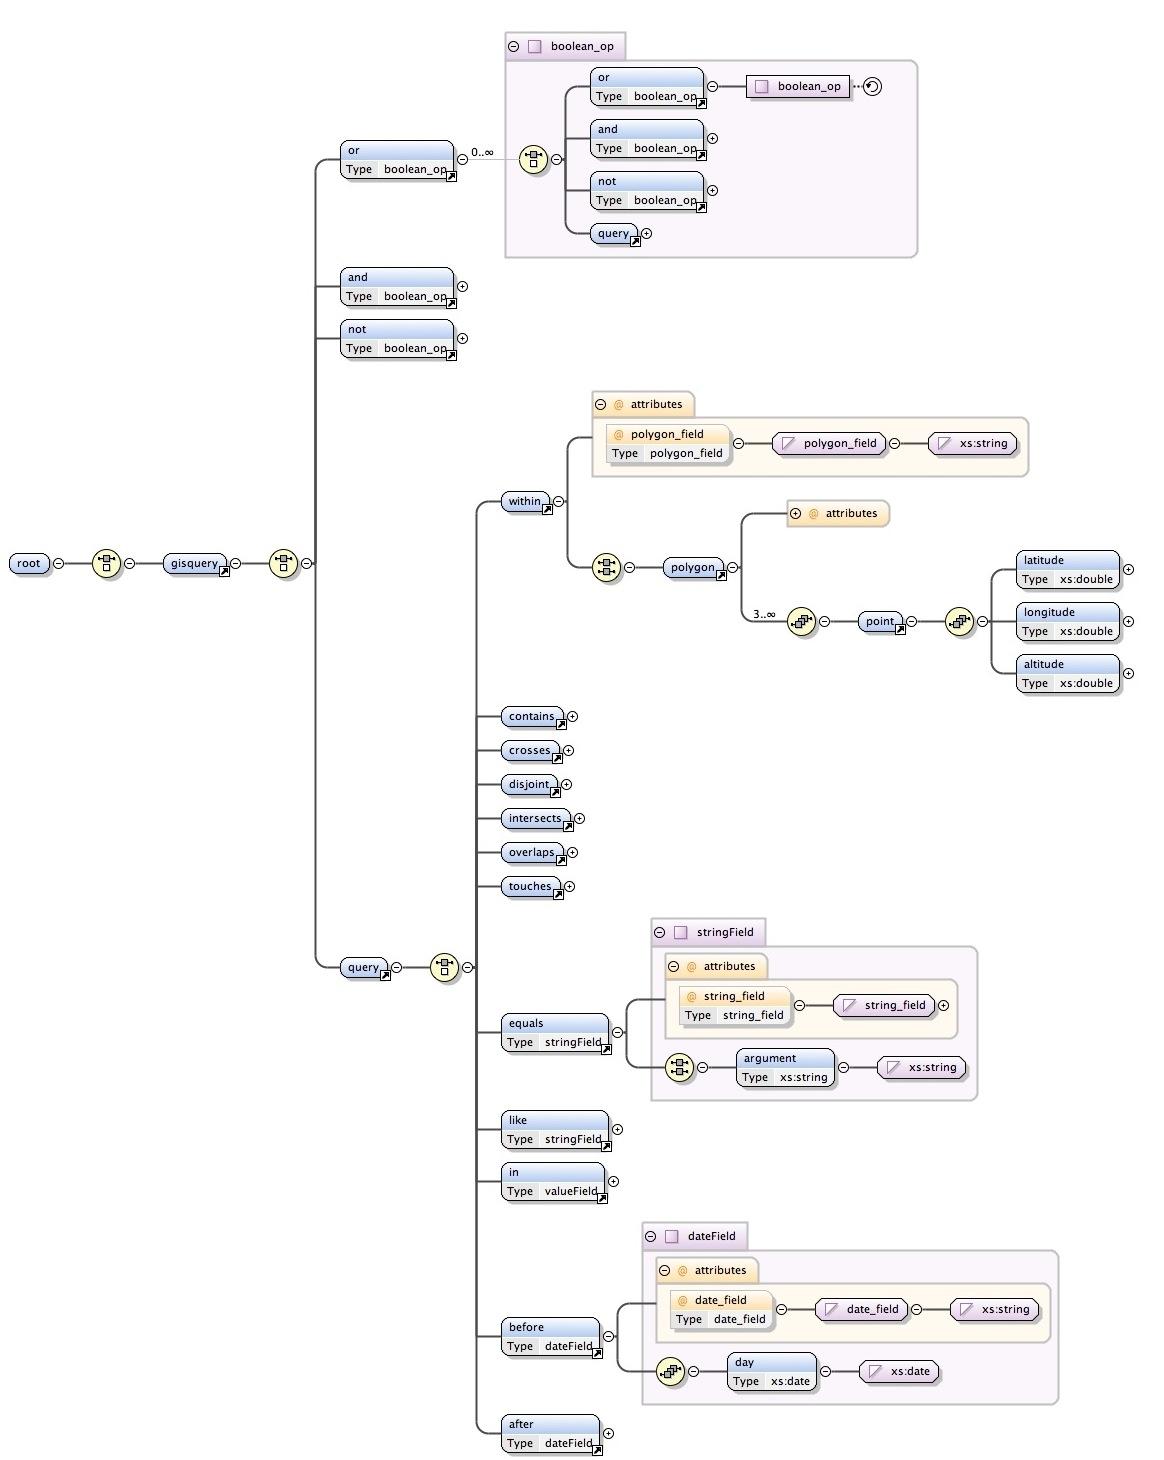 Sharing Botanical Information Using Geospatial Databases Logic Tree Diagram 20 Joao Miguel Rocha Da Silva Plantgis Language Graphical Representation